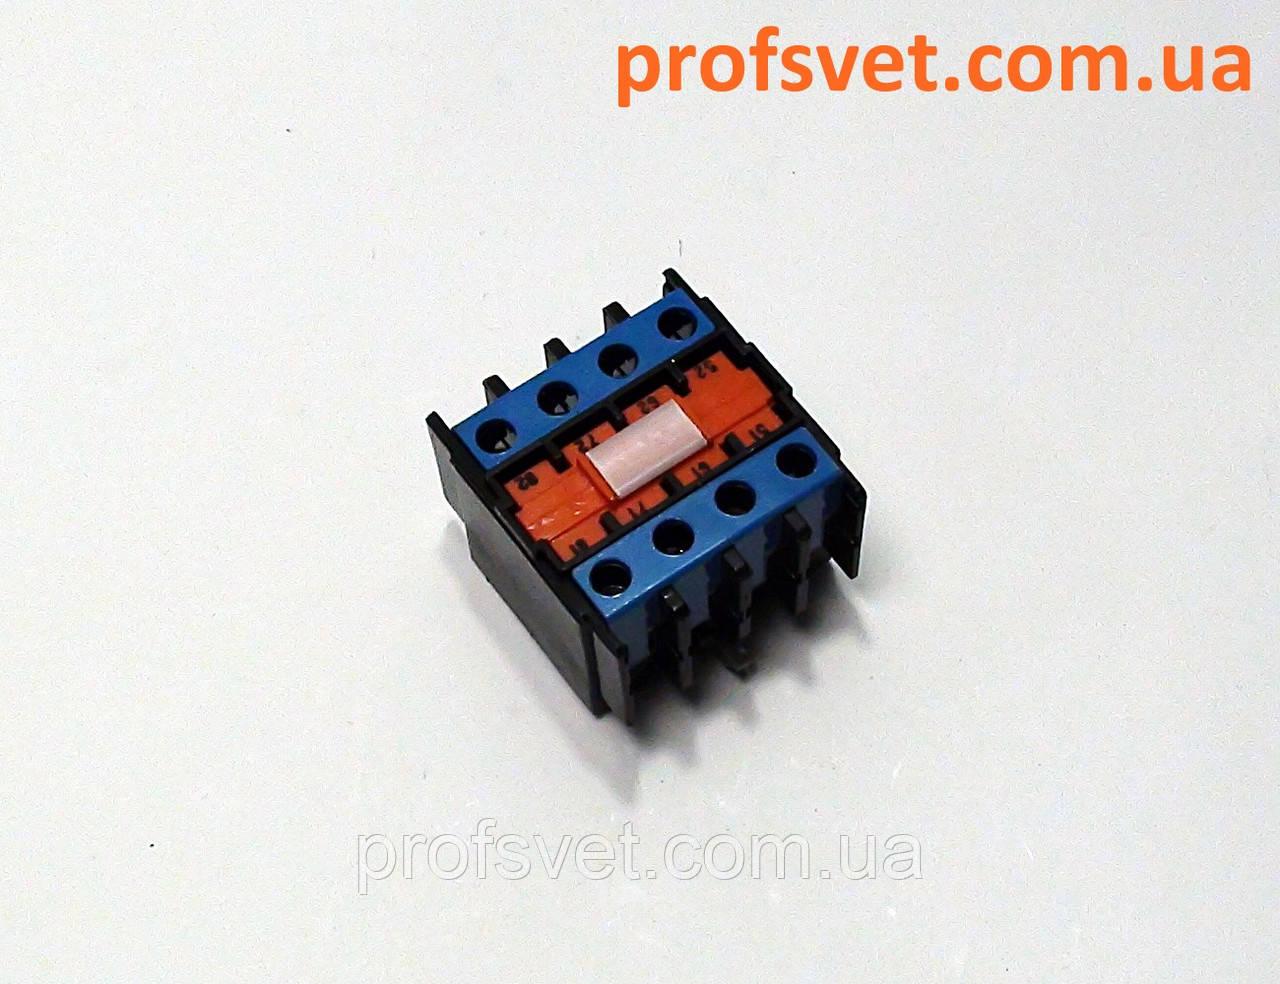 Приставка ПКЛ-40М 04А контакты 4 открытых